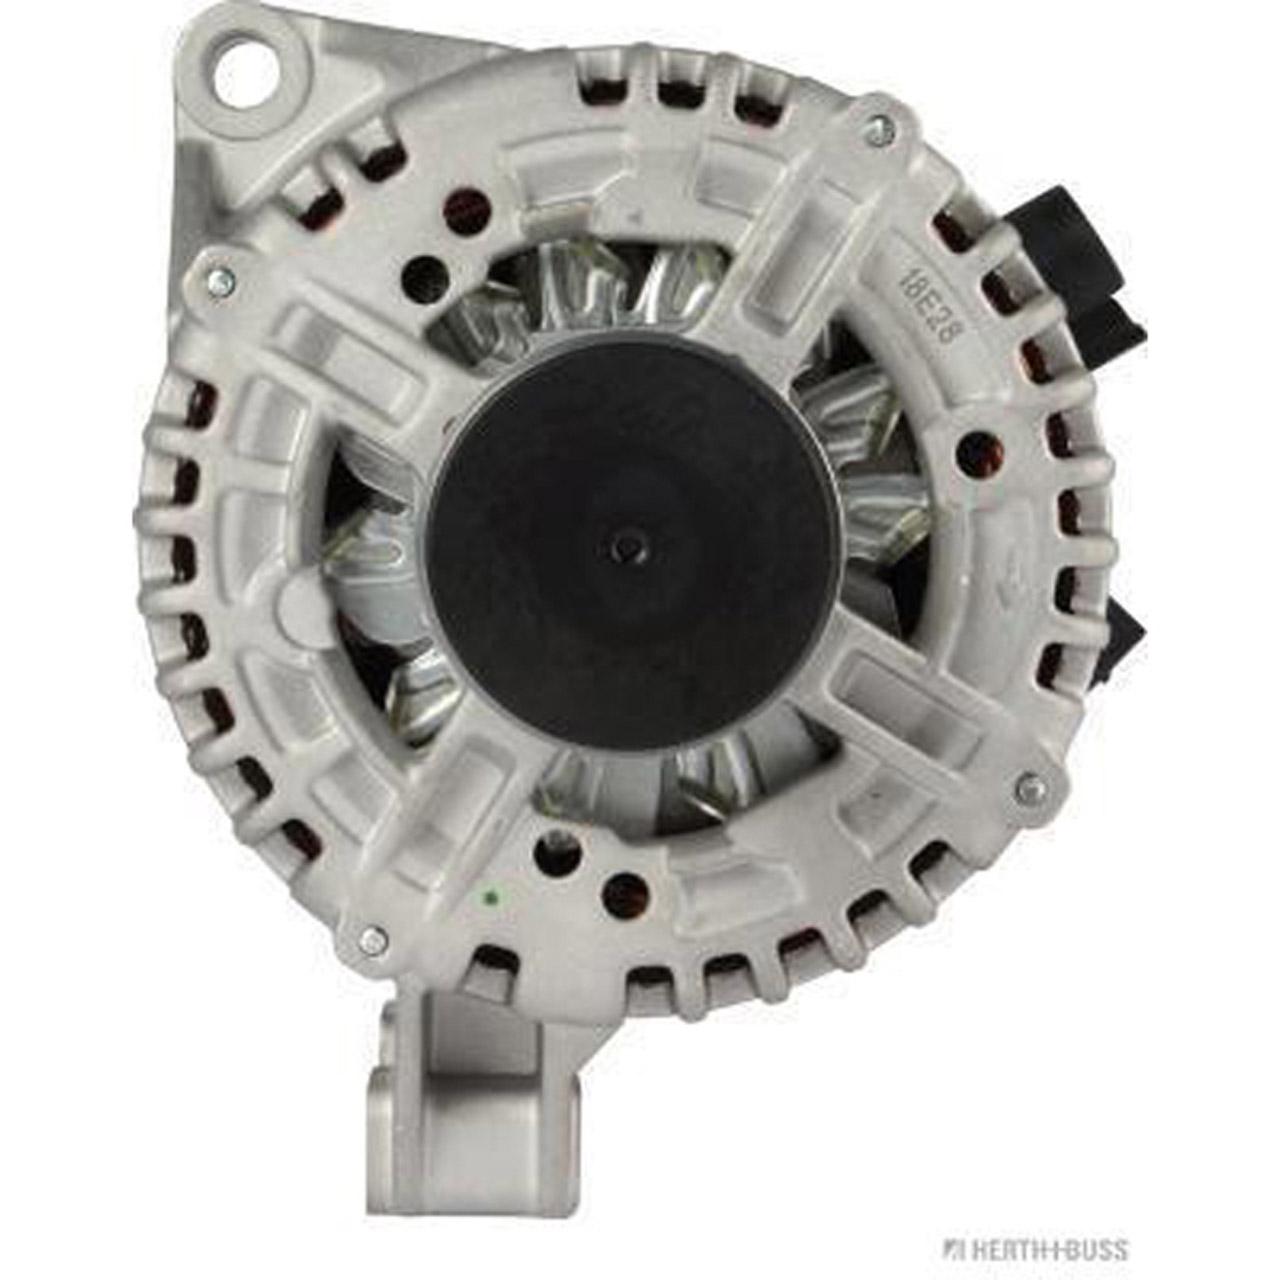 HERTH+BUSS Lichtmaschine 14V 150A FORD Mondeo IV MK4 S-Max (WA6) 2.5 220 PS